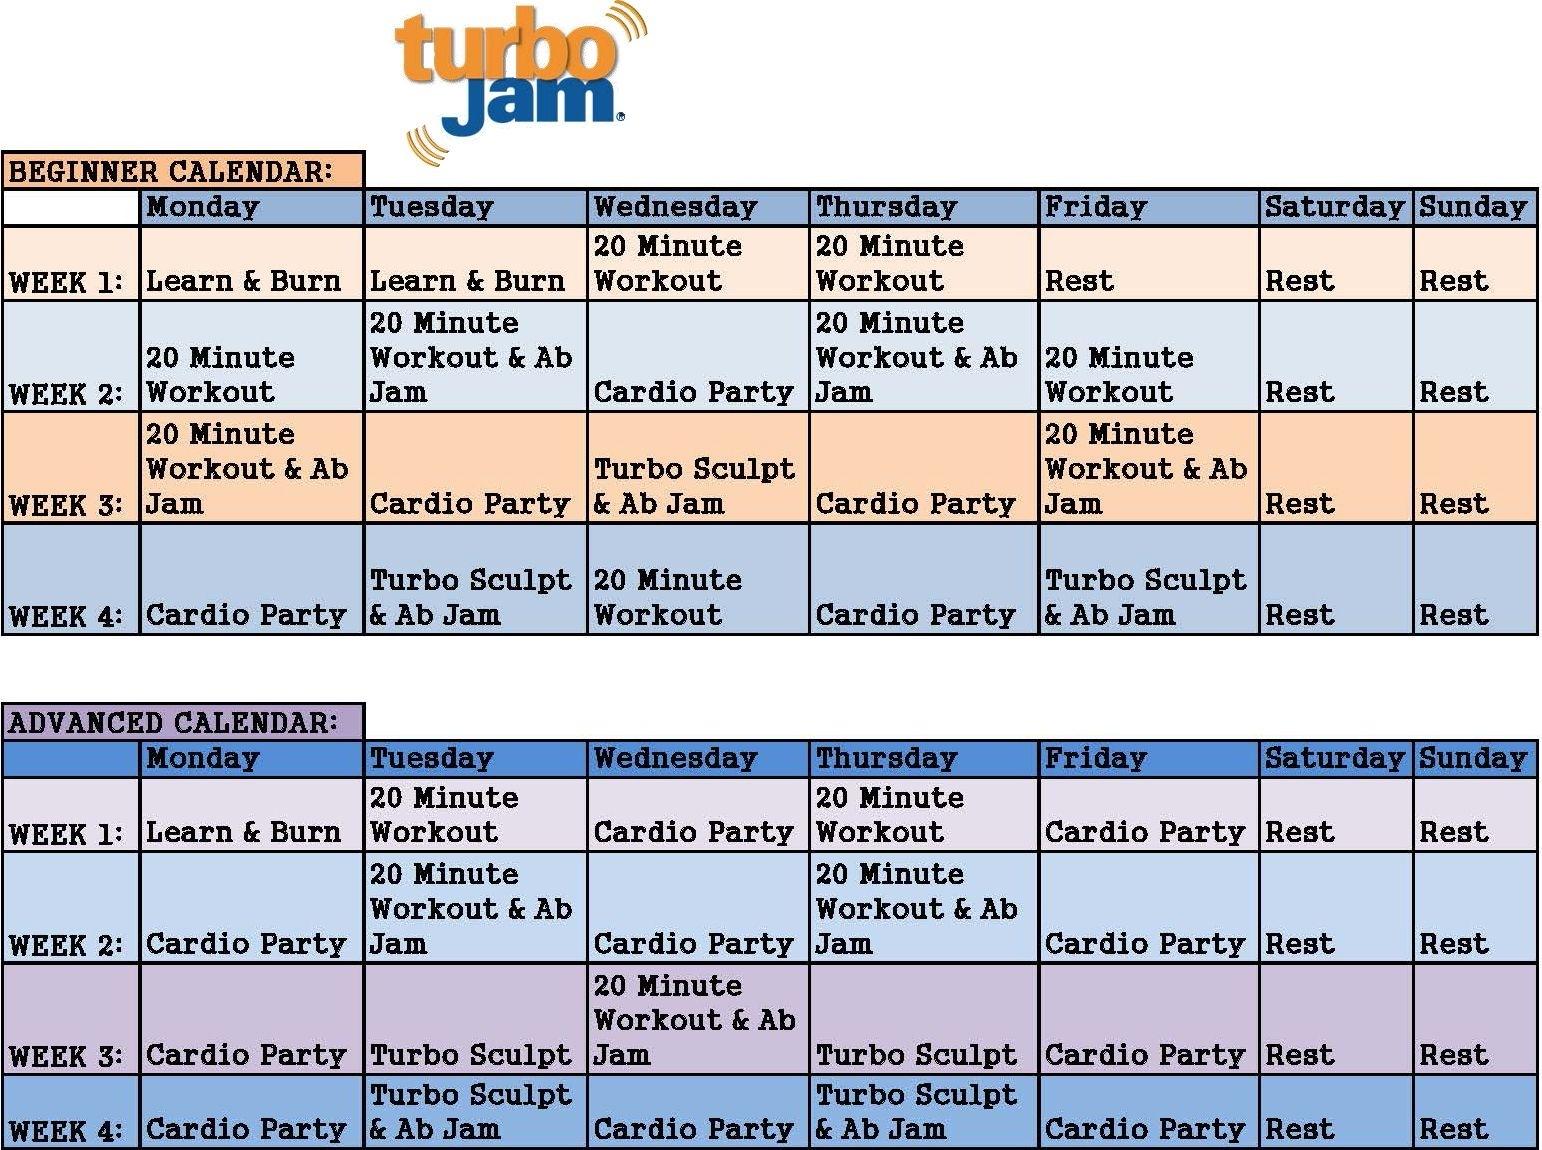 Chalene Johnson Turbo Jam Calendar From Beachbody (With